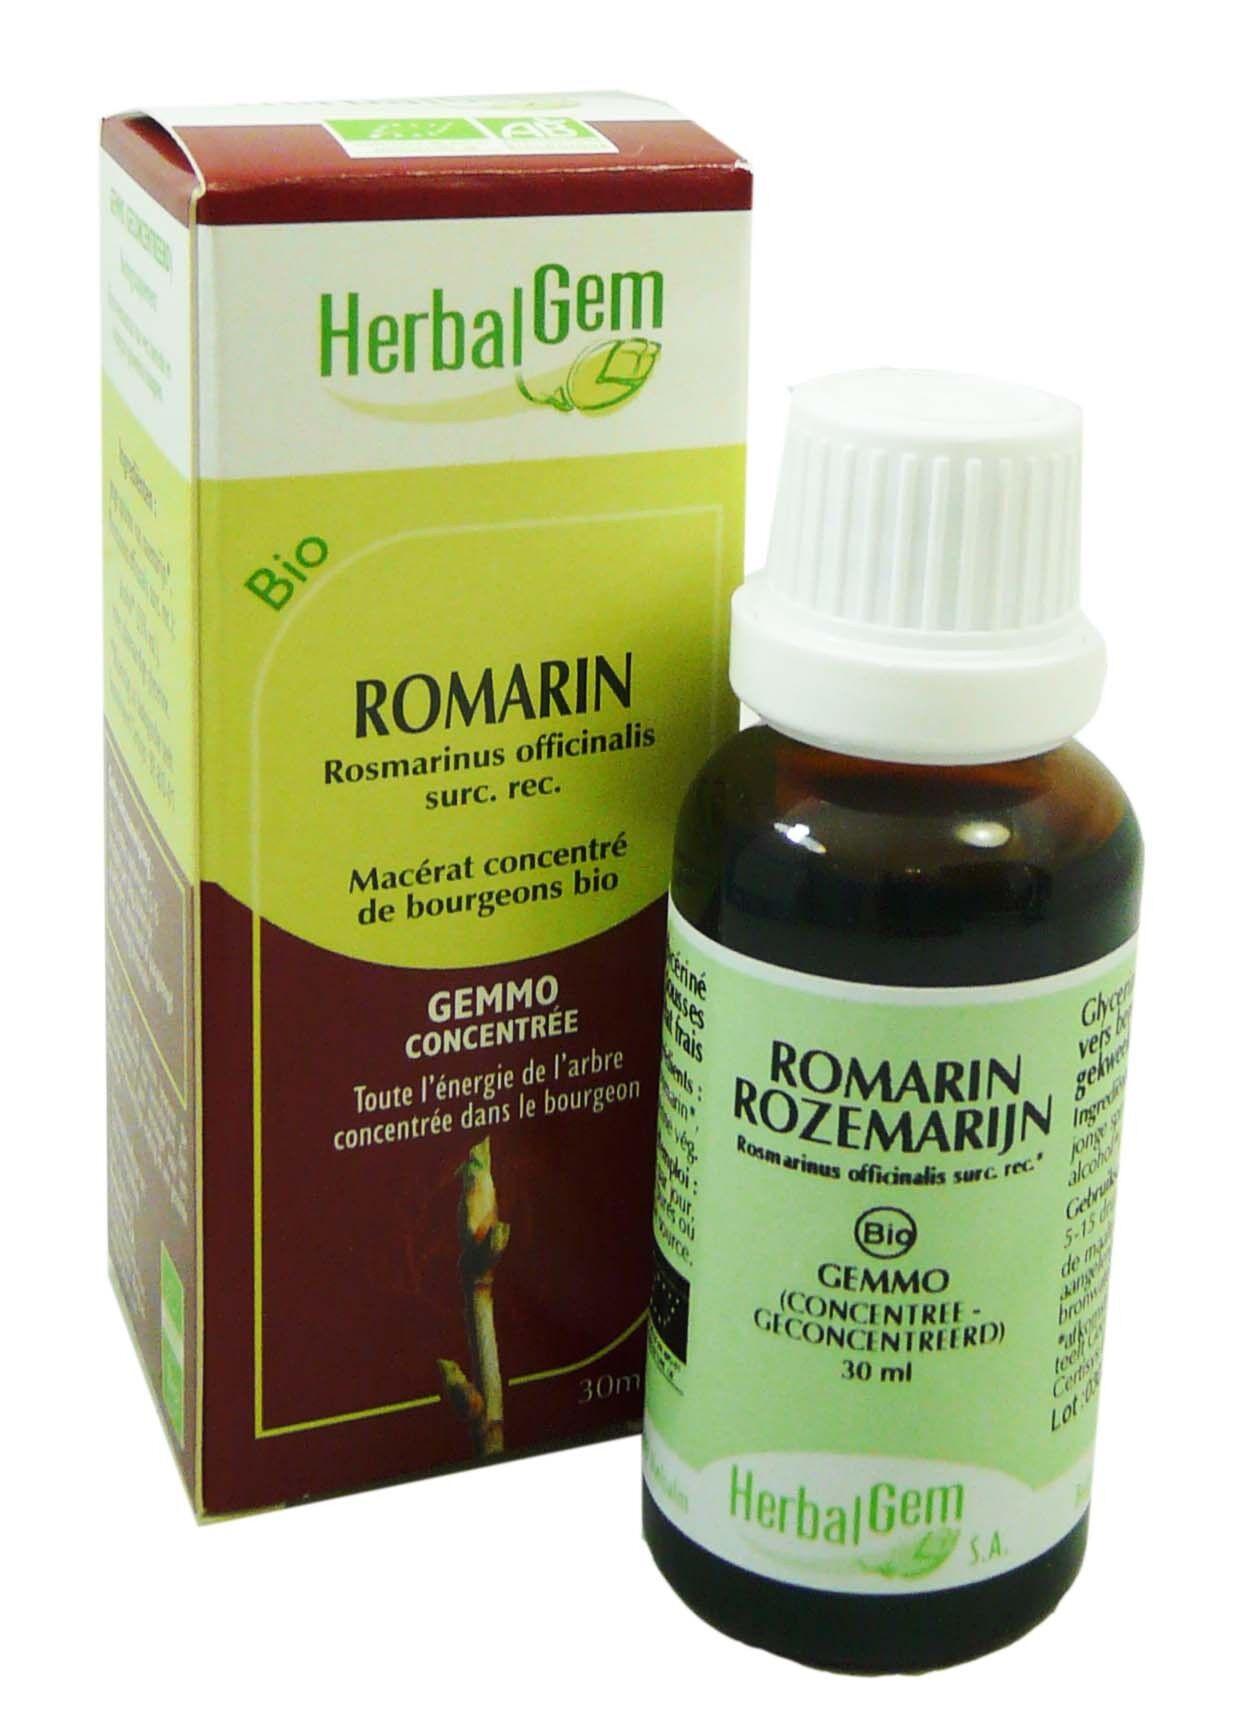 Herbalgem bio romarin gemmo concentre 30ml